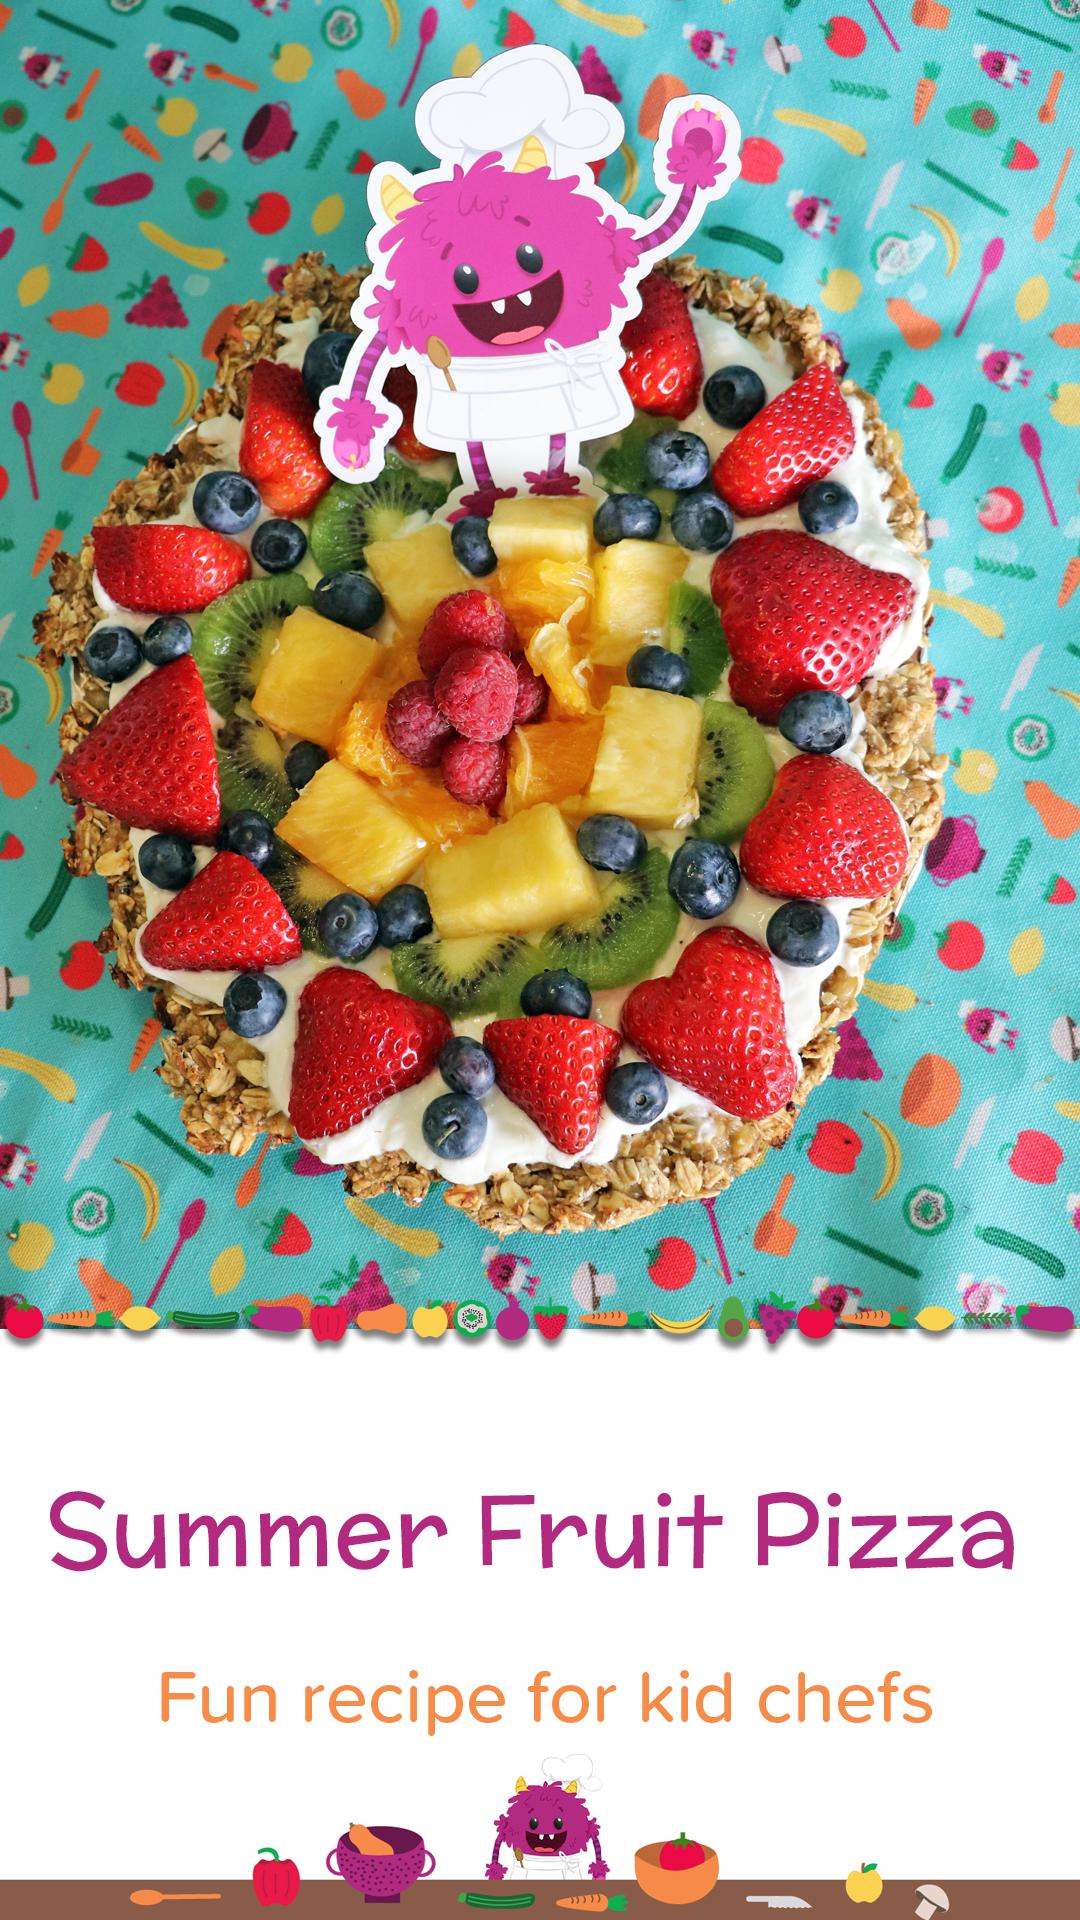 FruitPizza_pinterest_reg.png